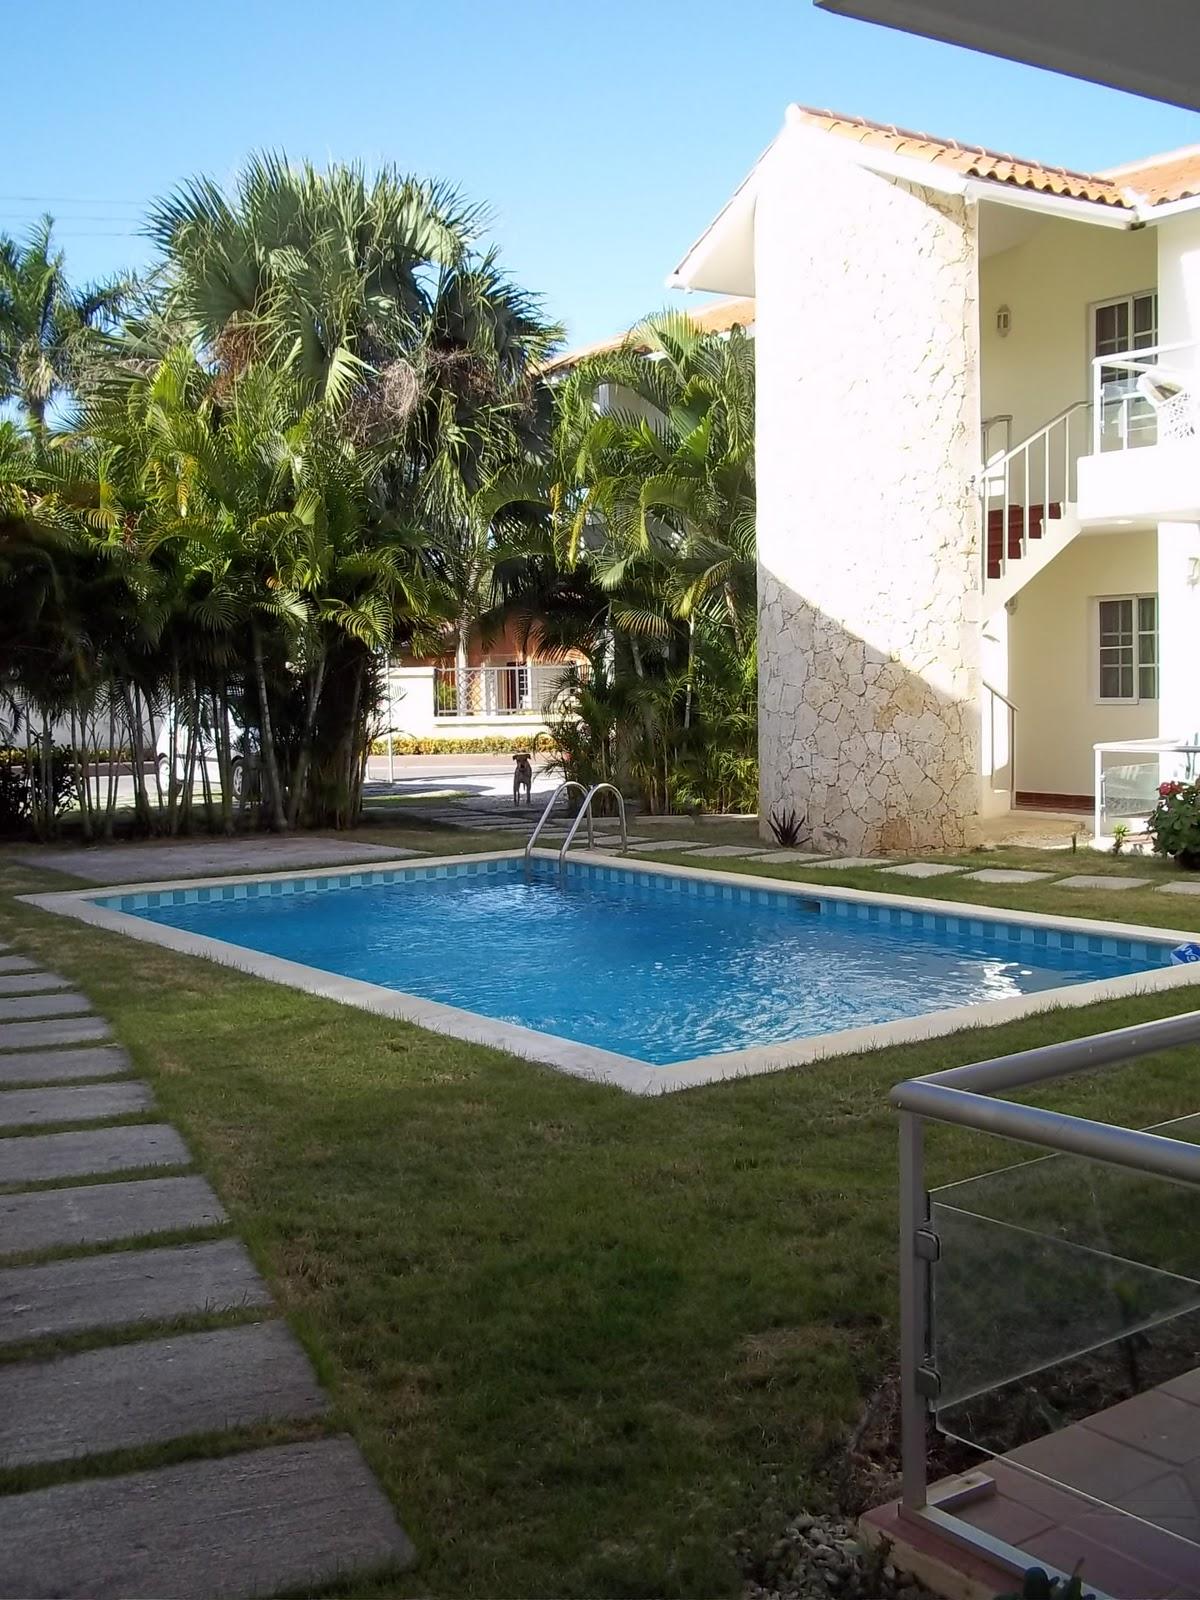 Apartamentos tur sticos en playa b varo punta cana rep blica dominicana - Alquiler apartamentos turisticos ...